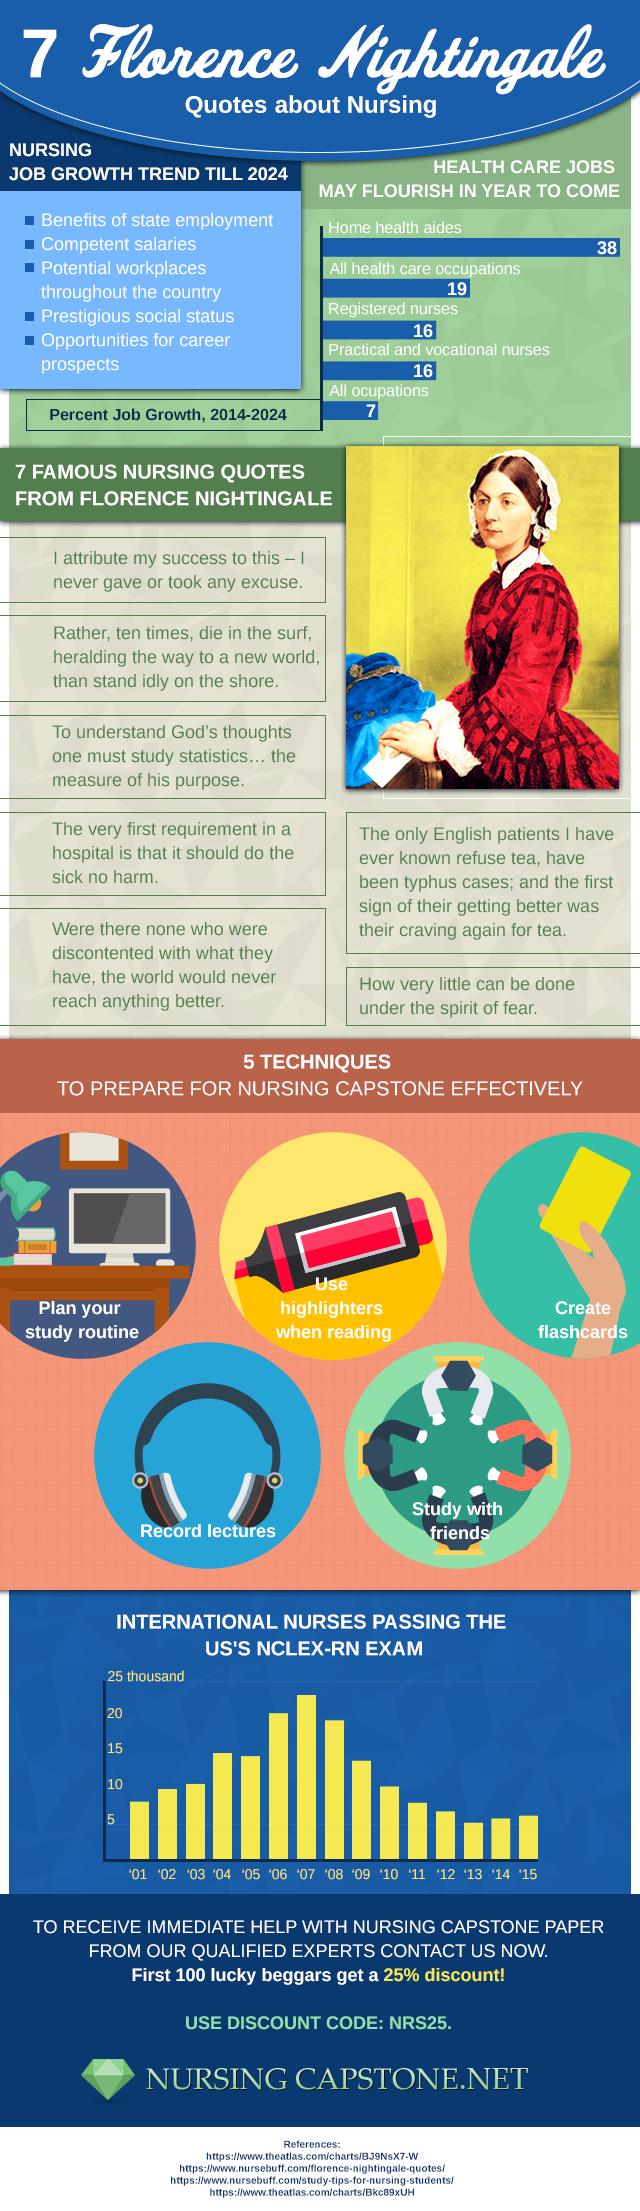 Professional Help with Your Nursing CPD Portfolio